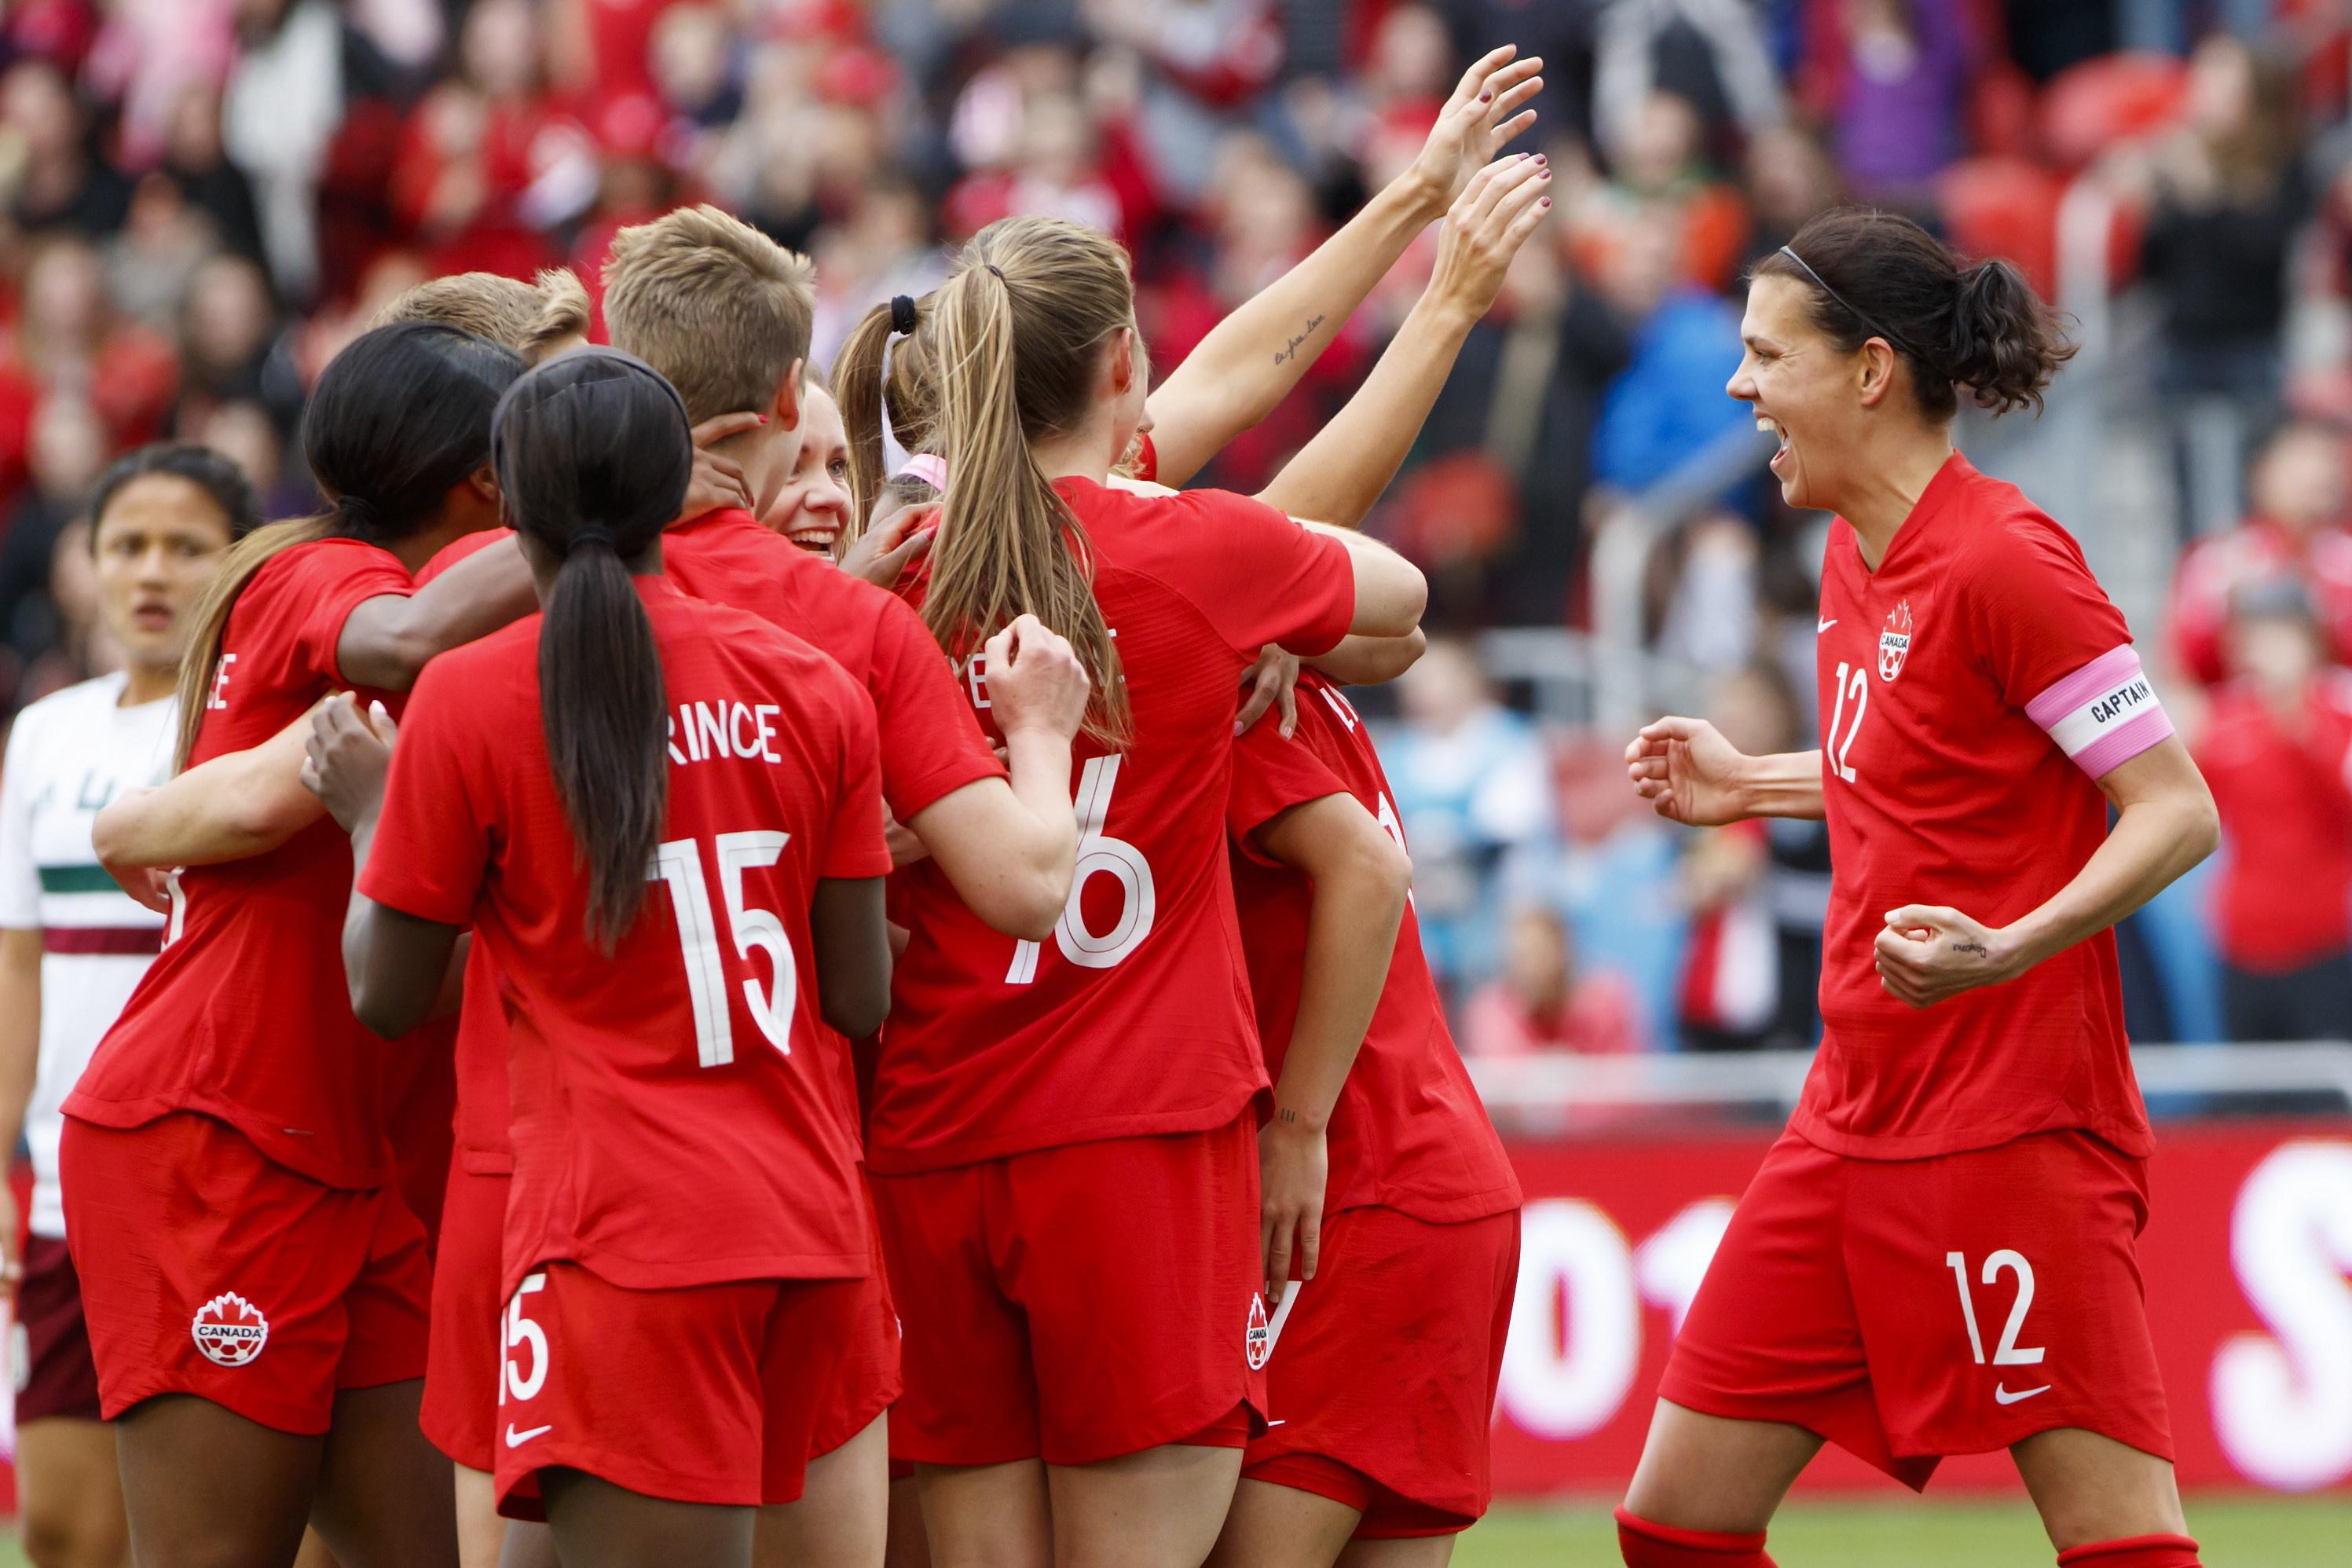 Team Canada celebrates after scoring a goal.